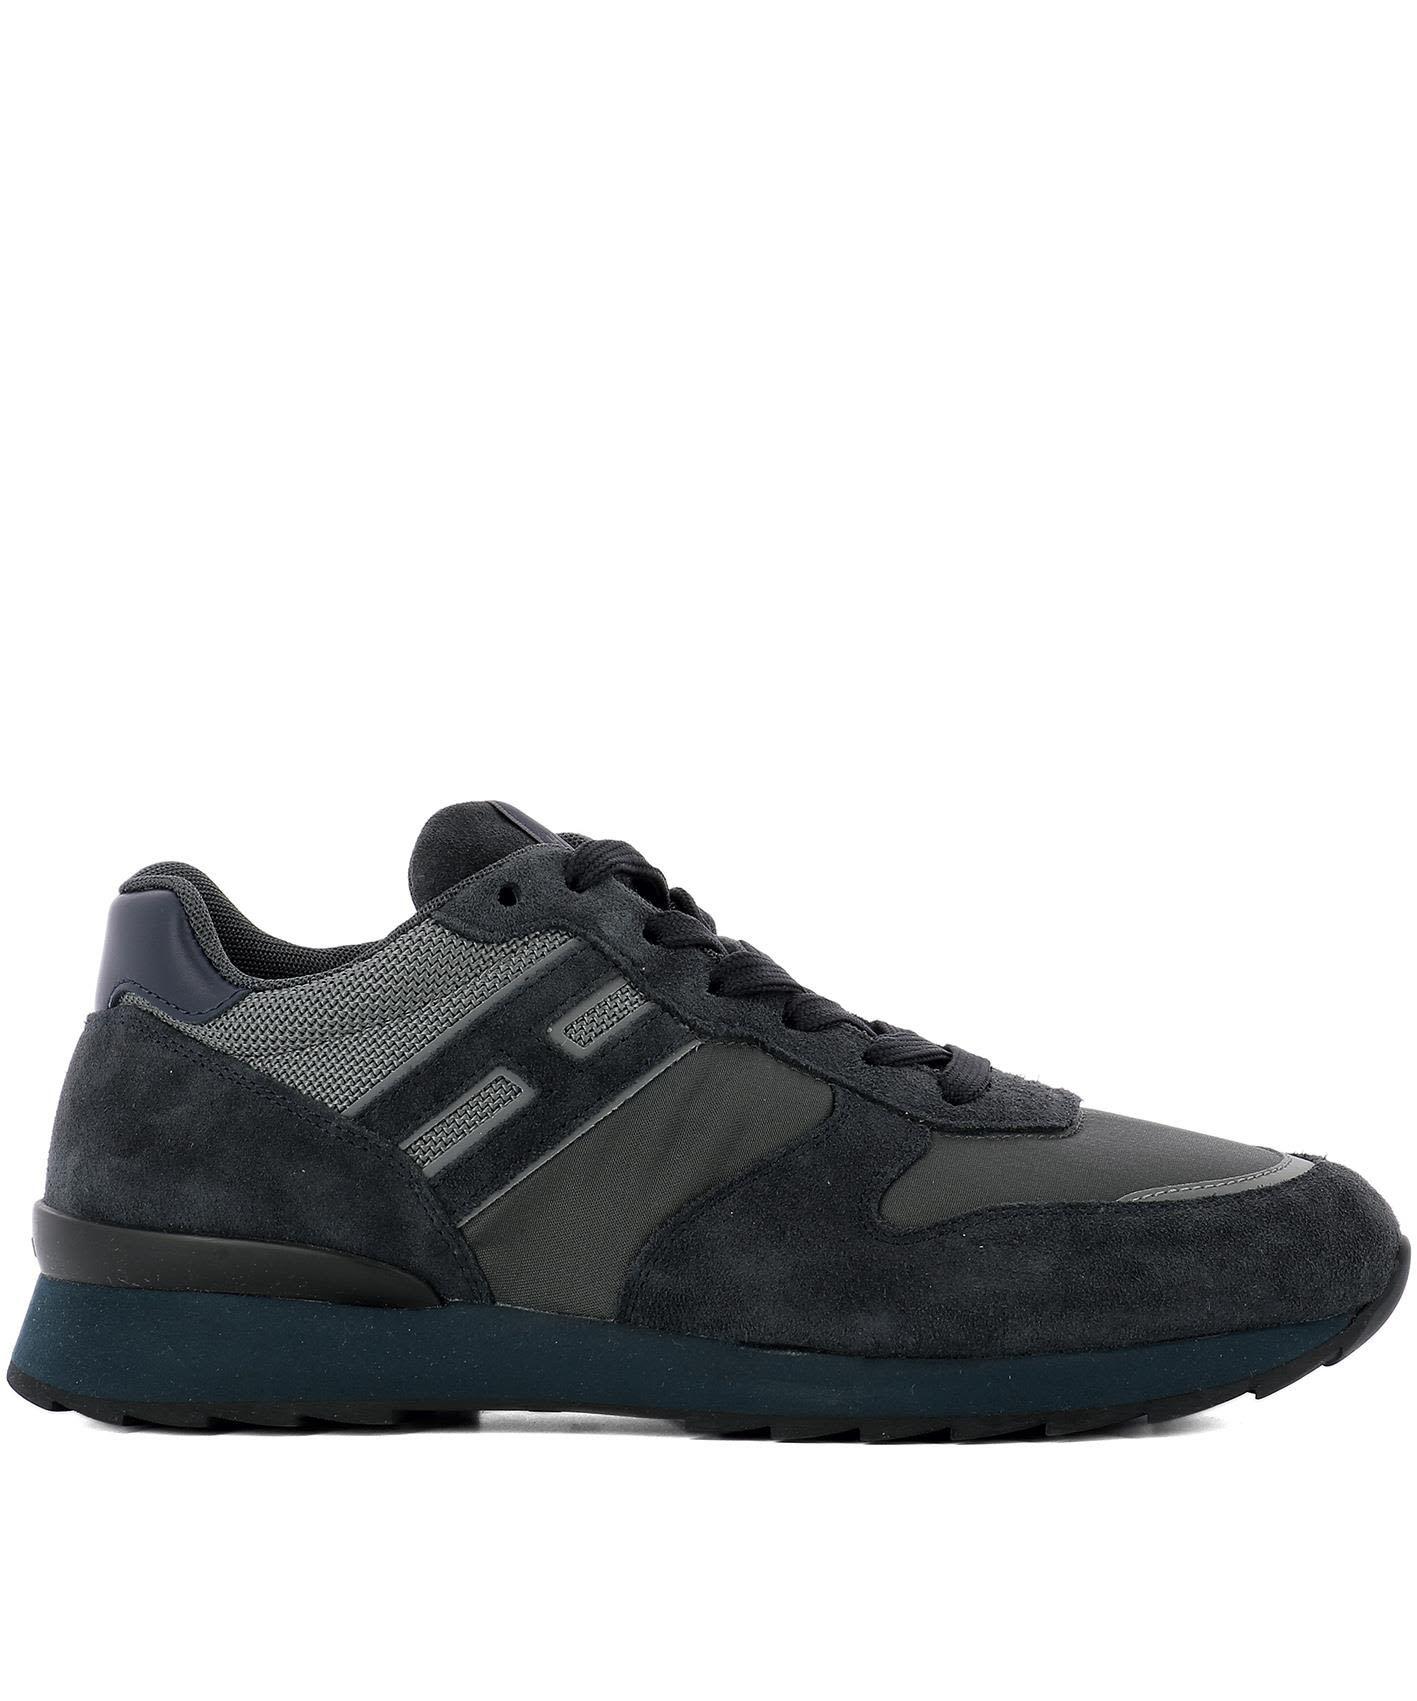 Sneaker H205 suede Logo light grey Hogan JYPUyKnBZ